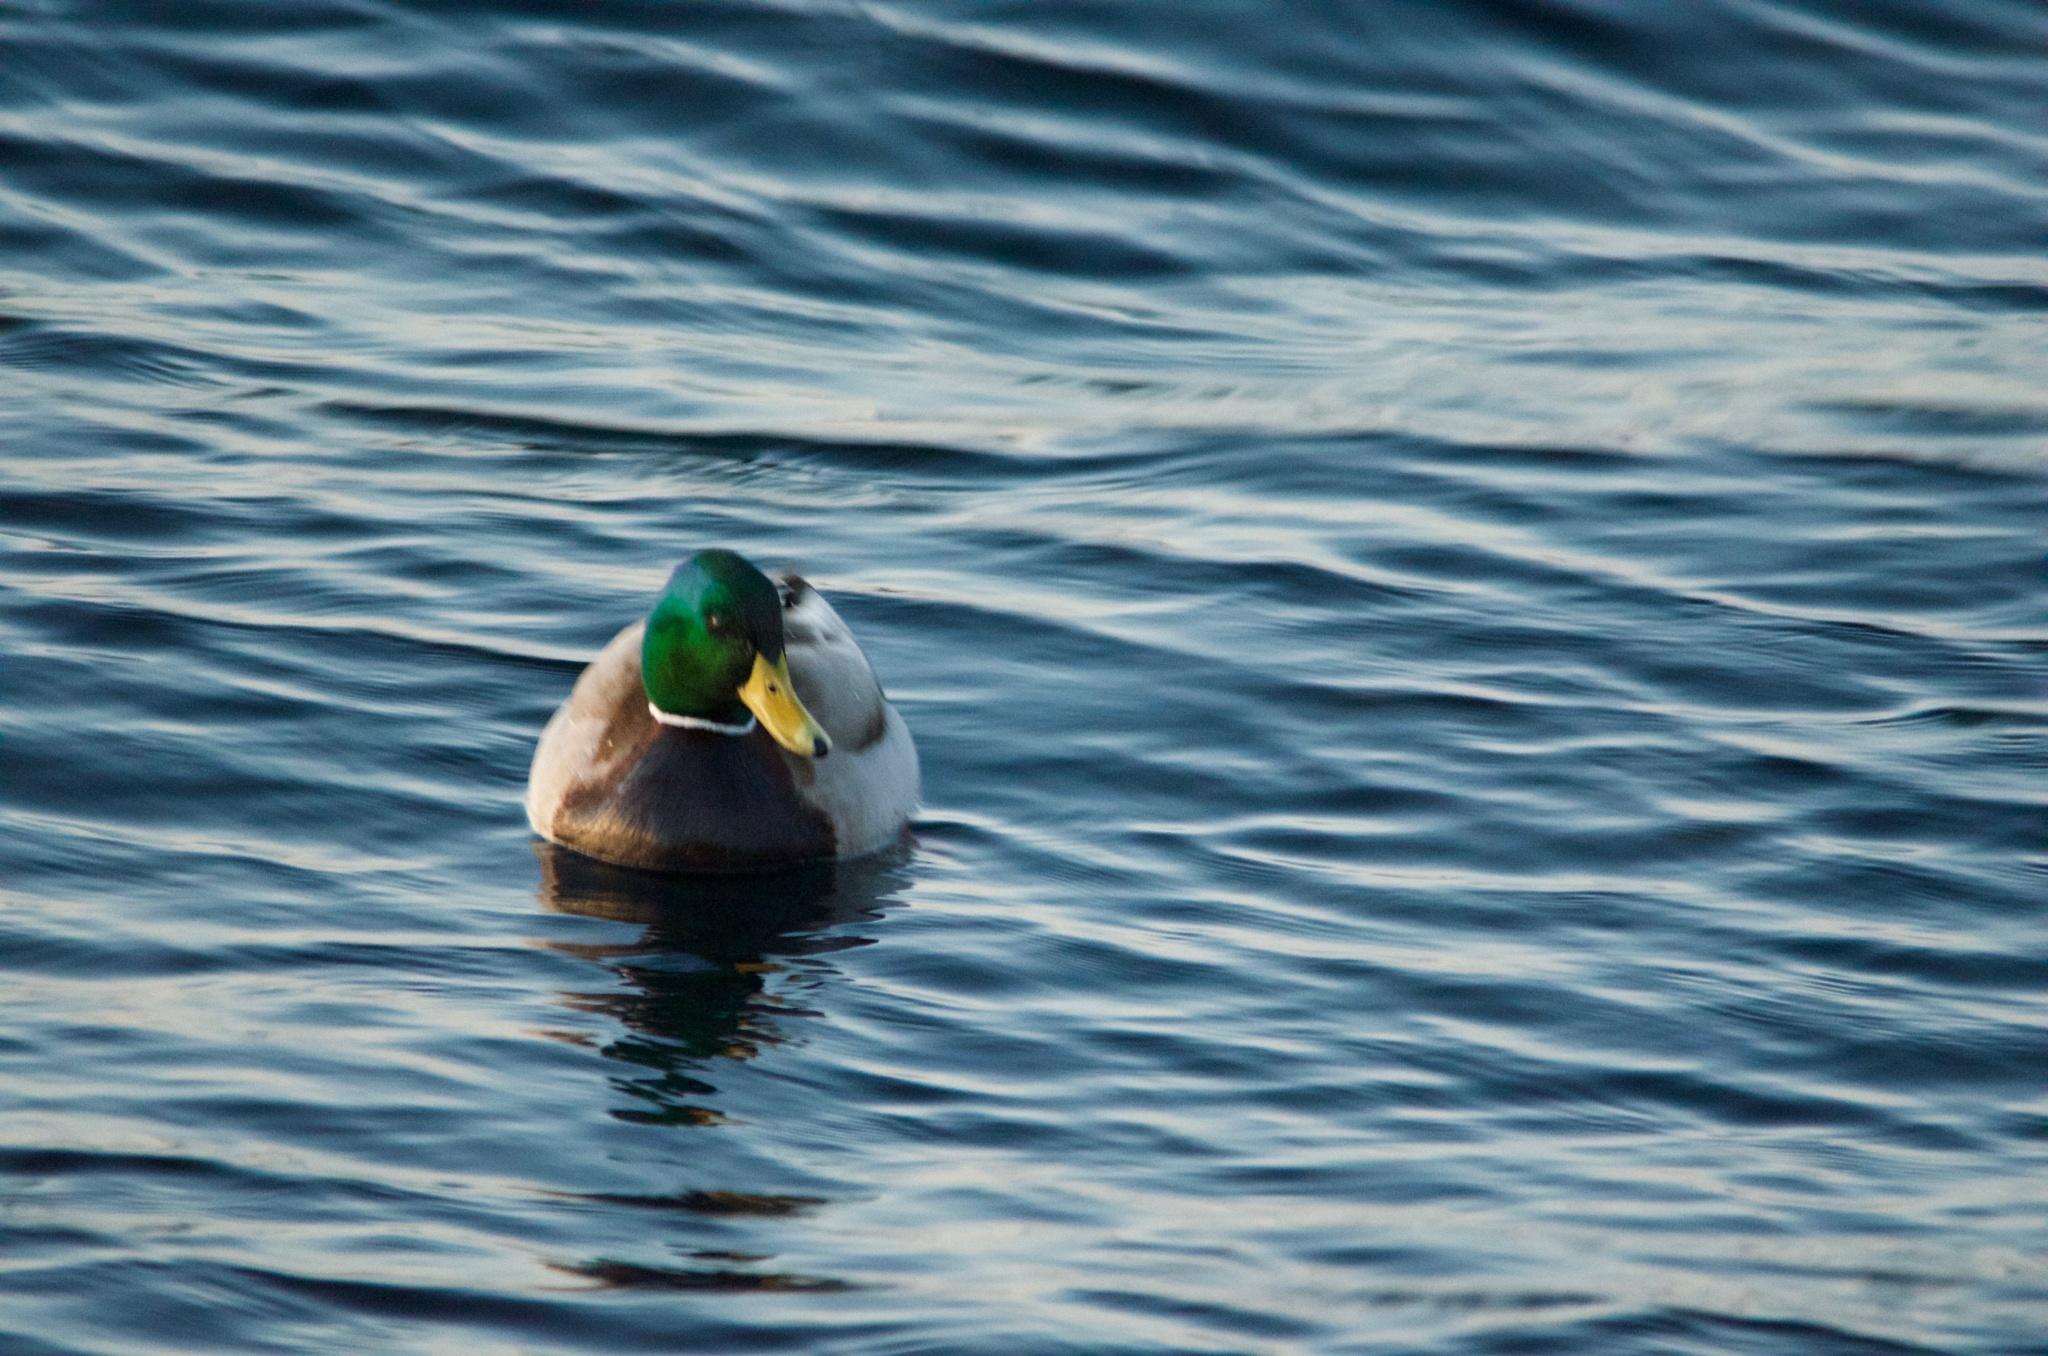 Mallard Drake at sea by Lars-Toralf Utnes Storstrand